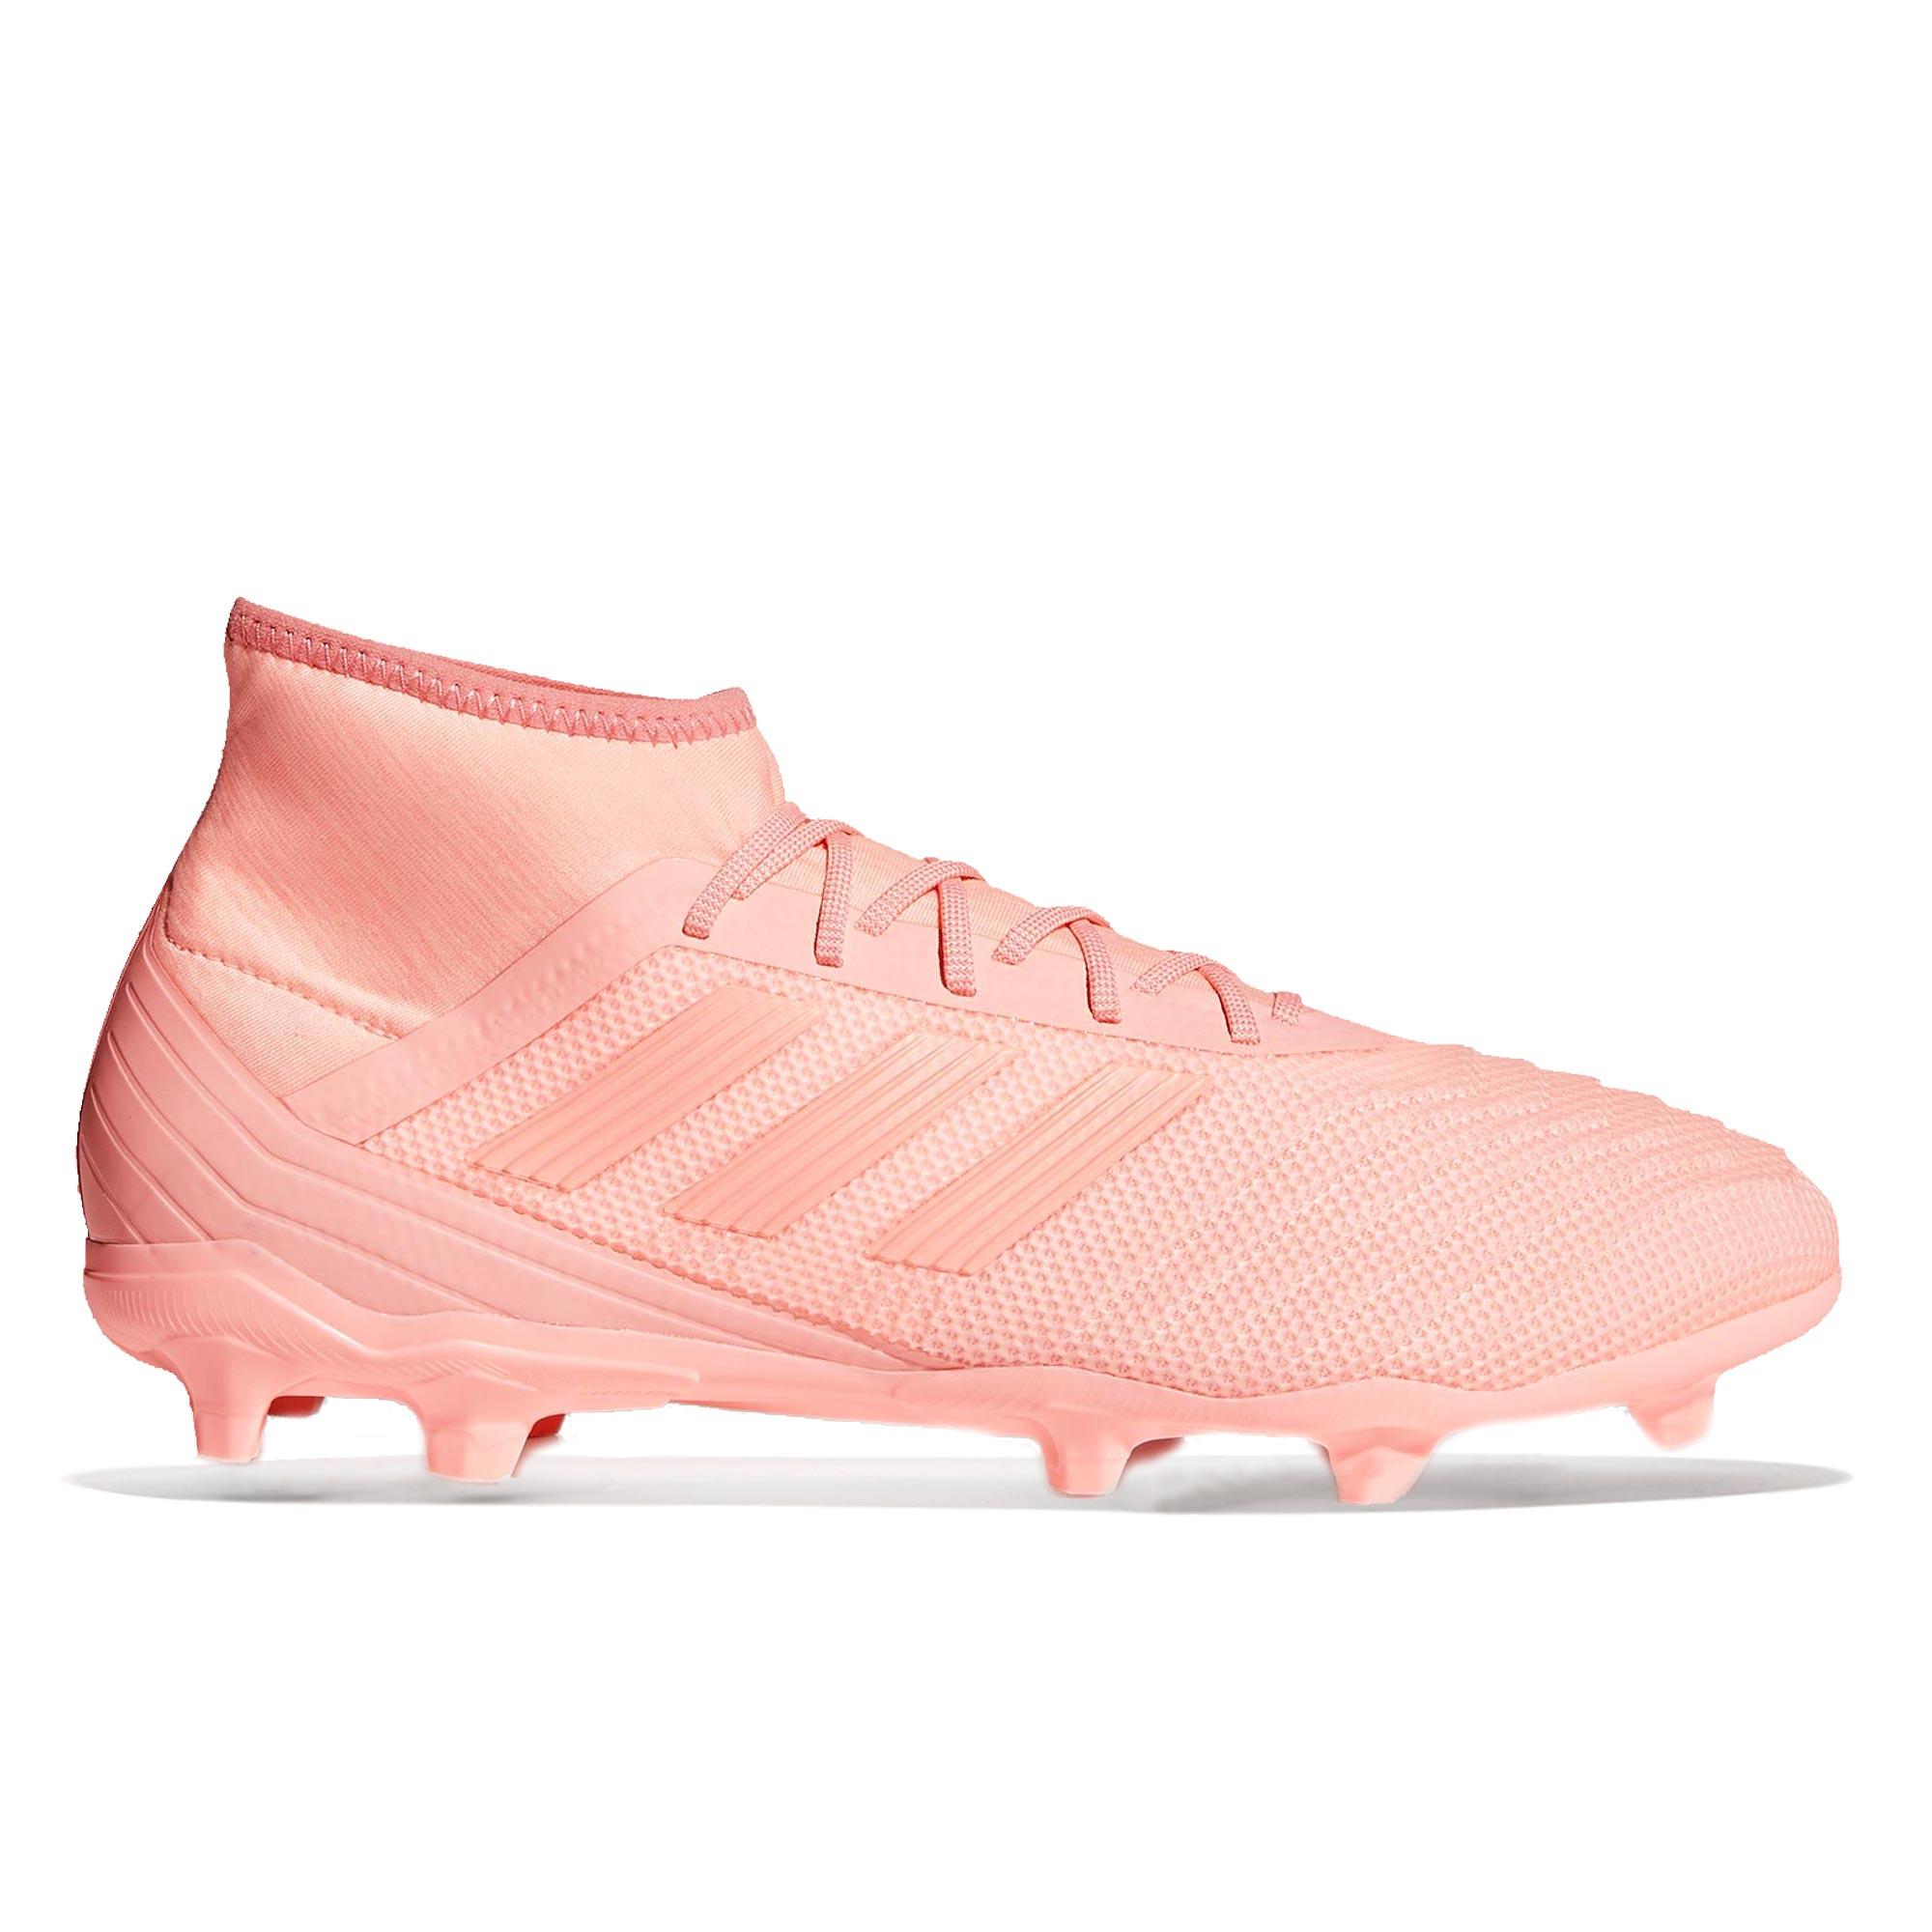 Adidas Predator 18.2 Firm Ground Football Boots - Orange